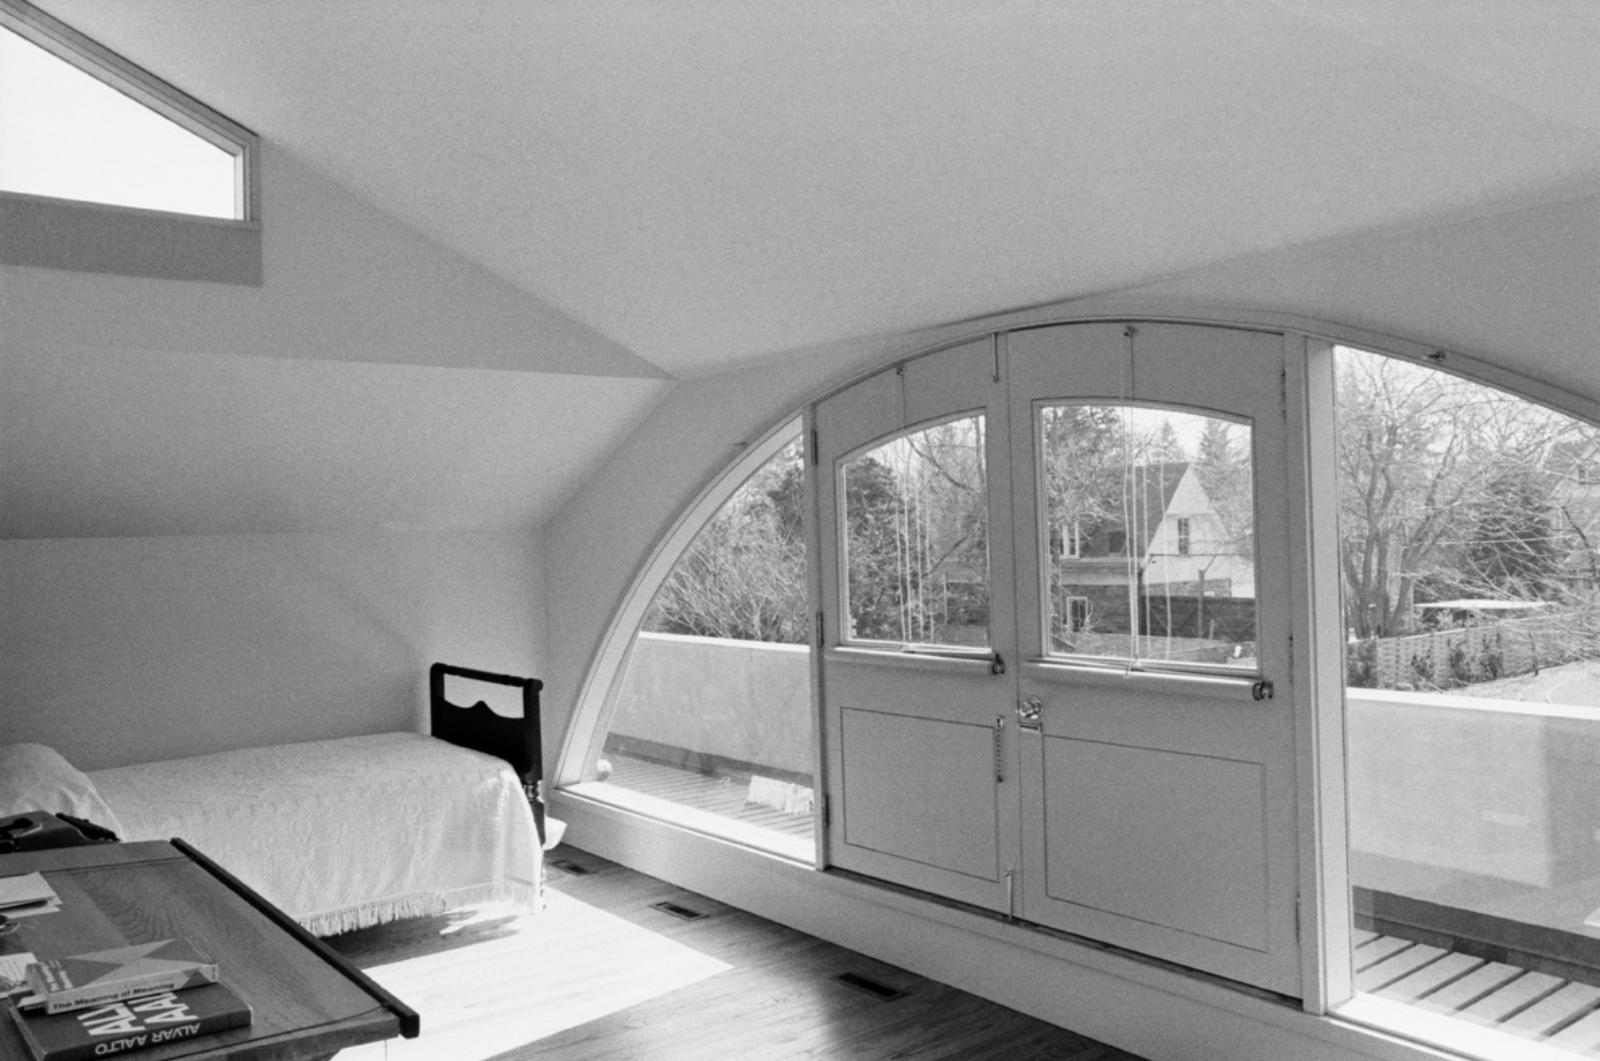 Robert Venturi: The Architect Who Shunned 'Signature Style'